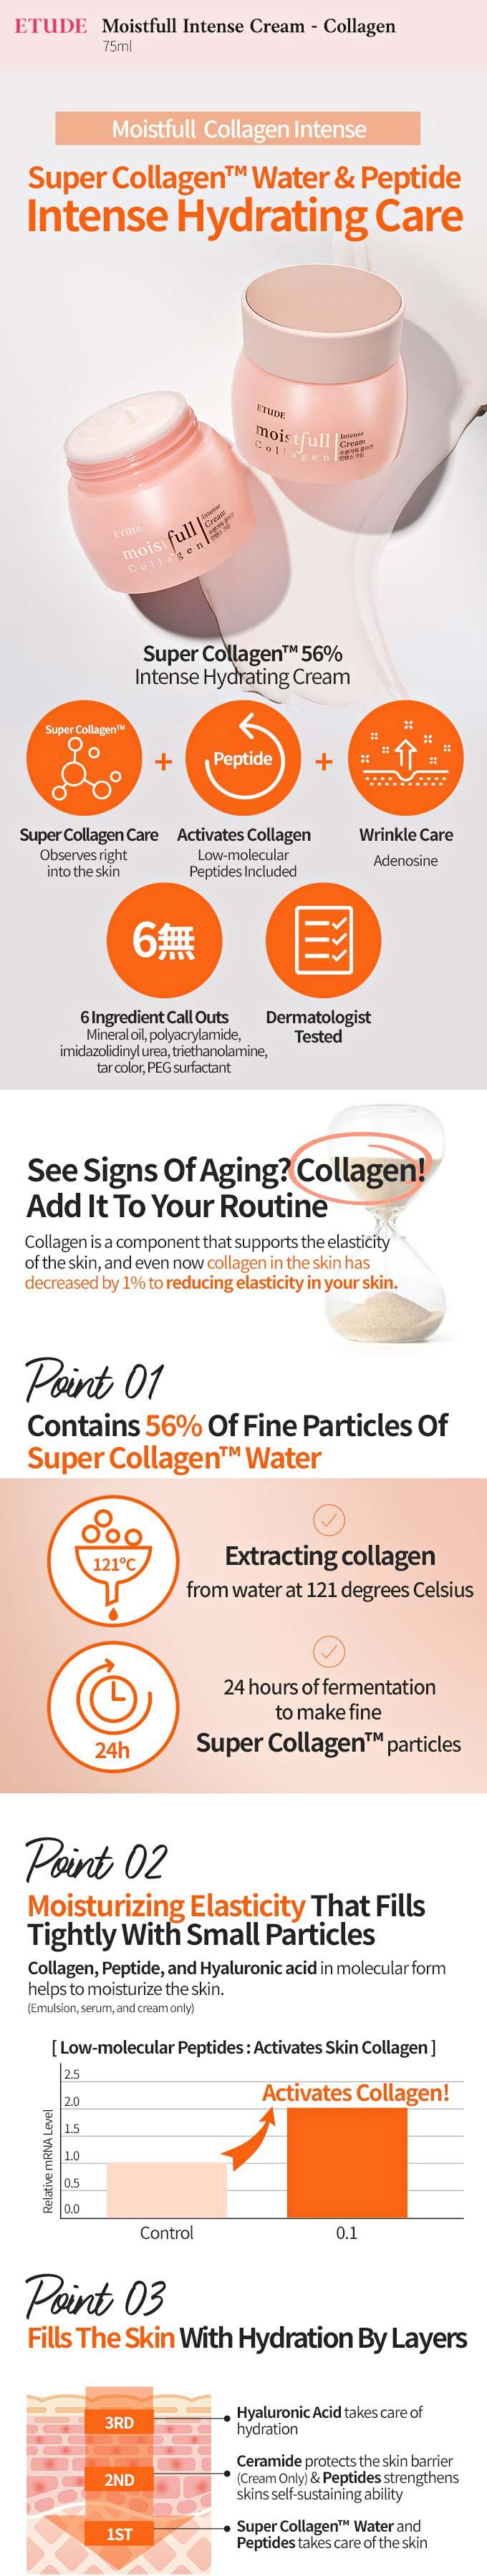 moistfull-collagen-intense-cream-des-01.jpg